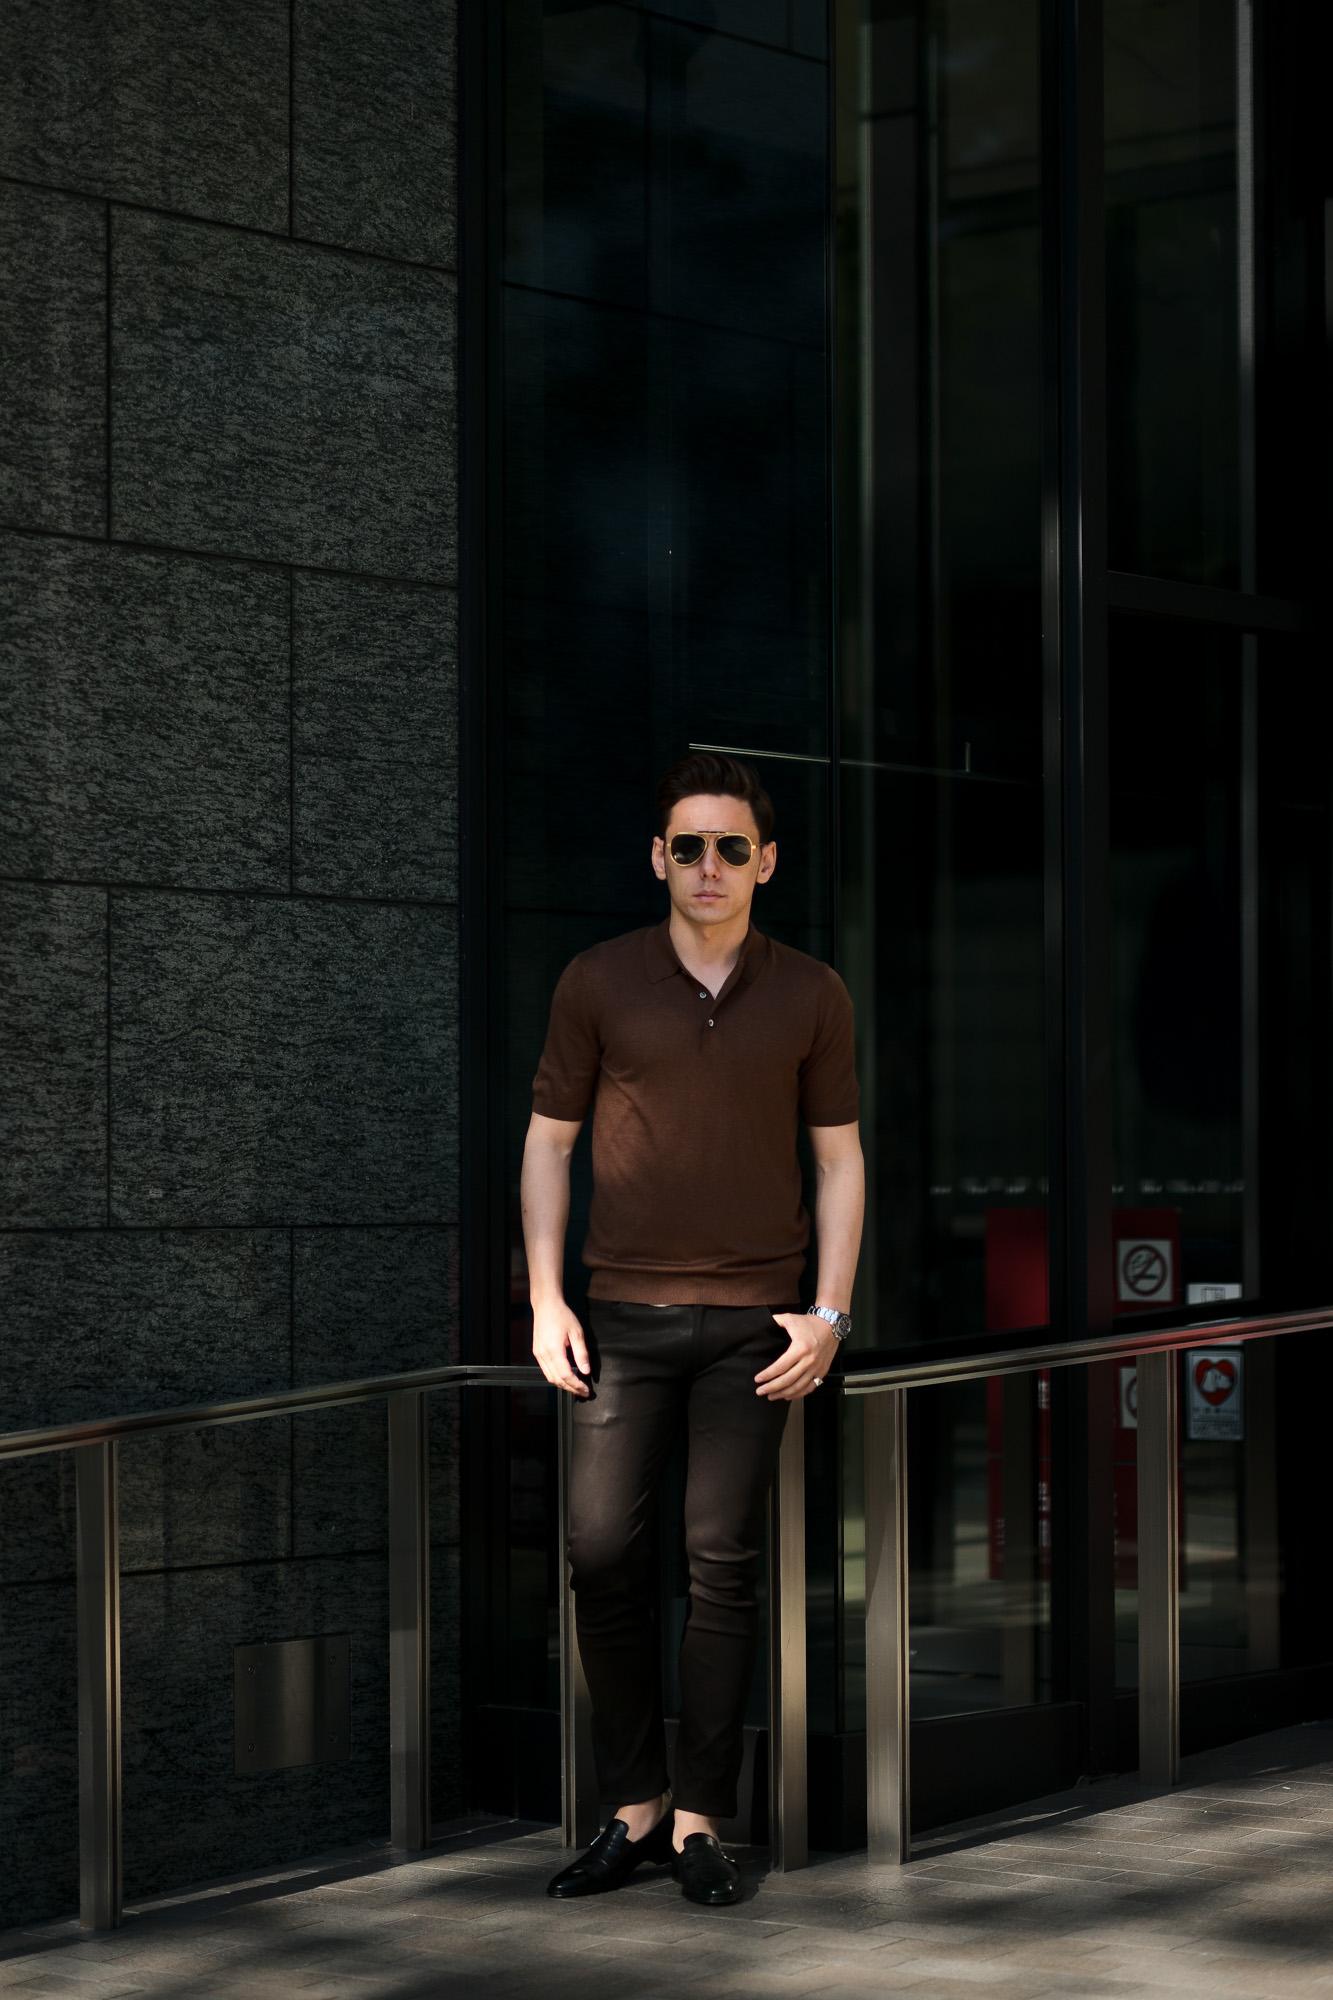 Gran Sasso (グランサッソ) Silk Knit Polo Shirt (シルクニットポロシャツ) SETA (シルク 100%) シルク ニット ポロシャツ GOLD (ゴールド・170) made in italy (イタリア製) 2020 春夏新作  愛知 名古屋 altoediritto アルトエデリット